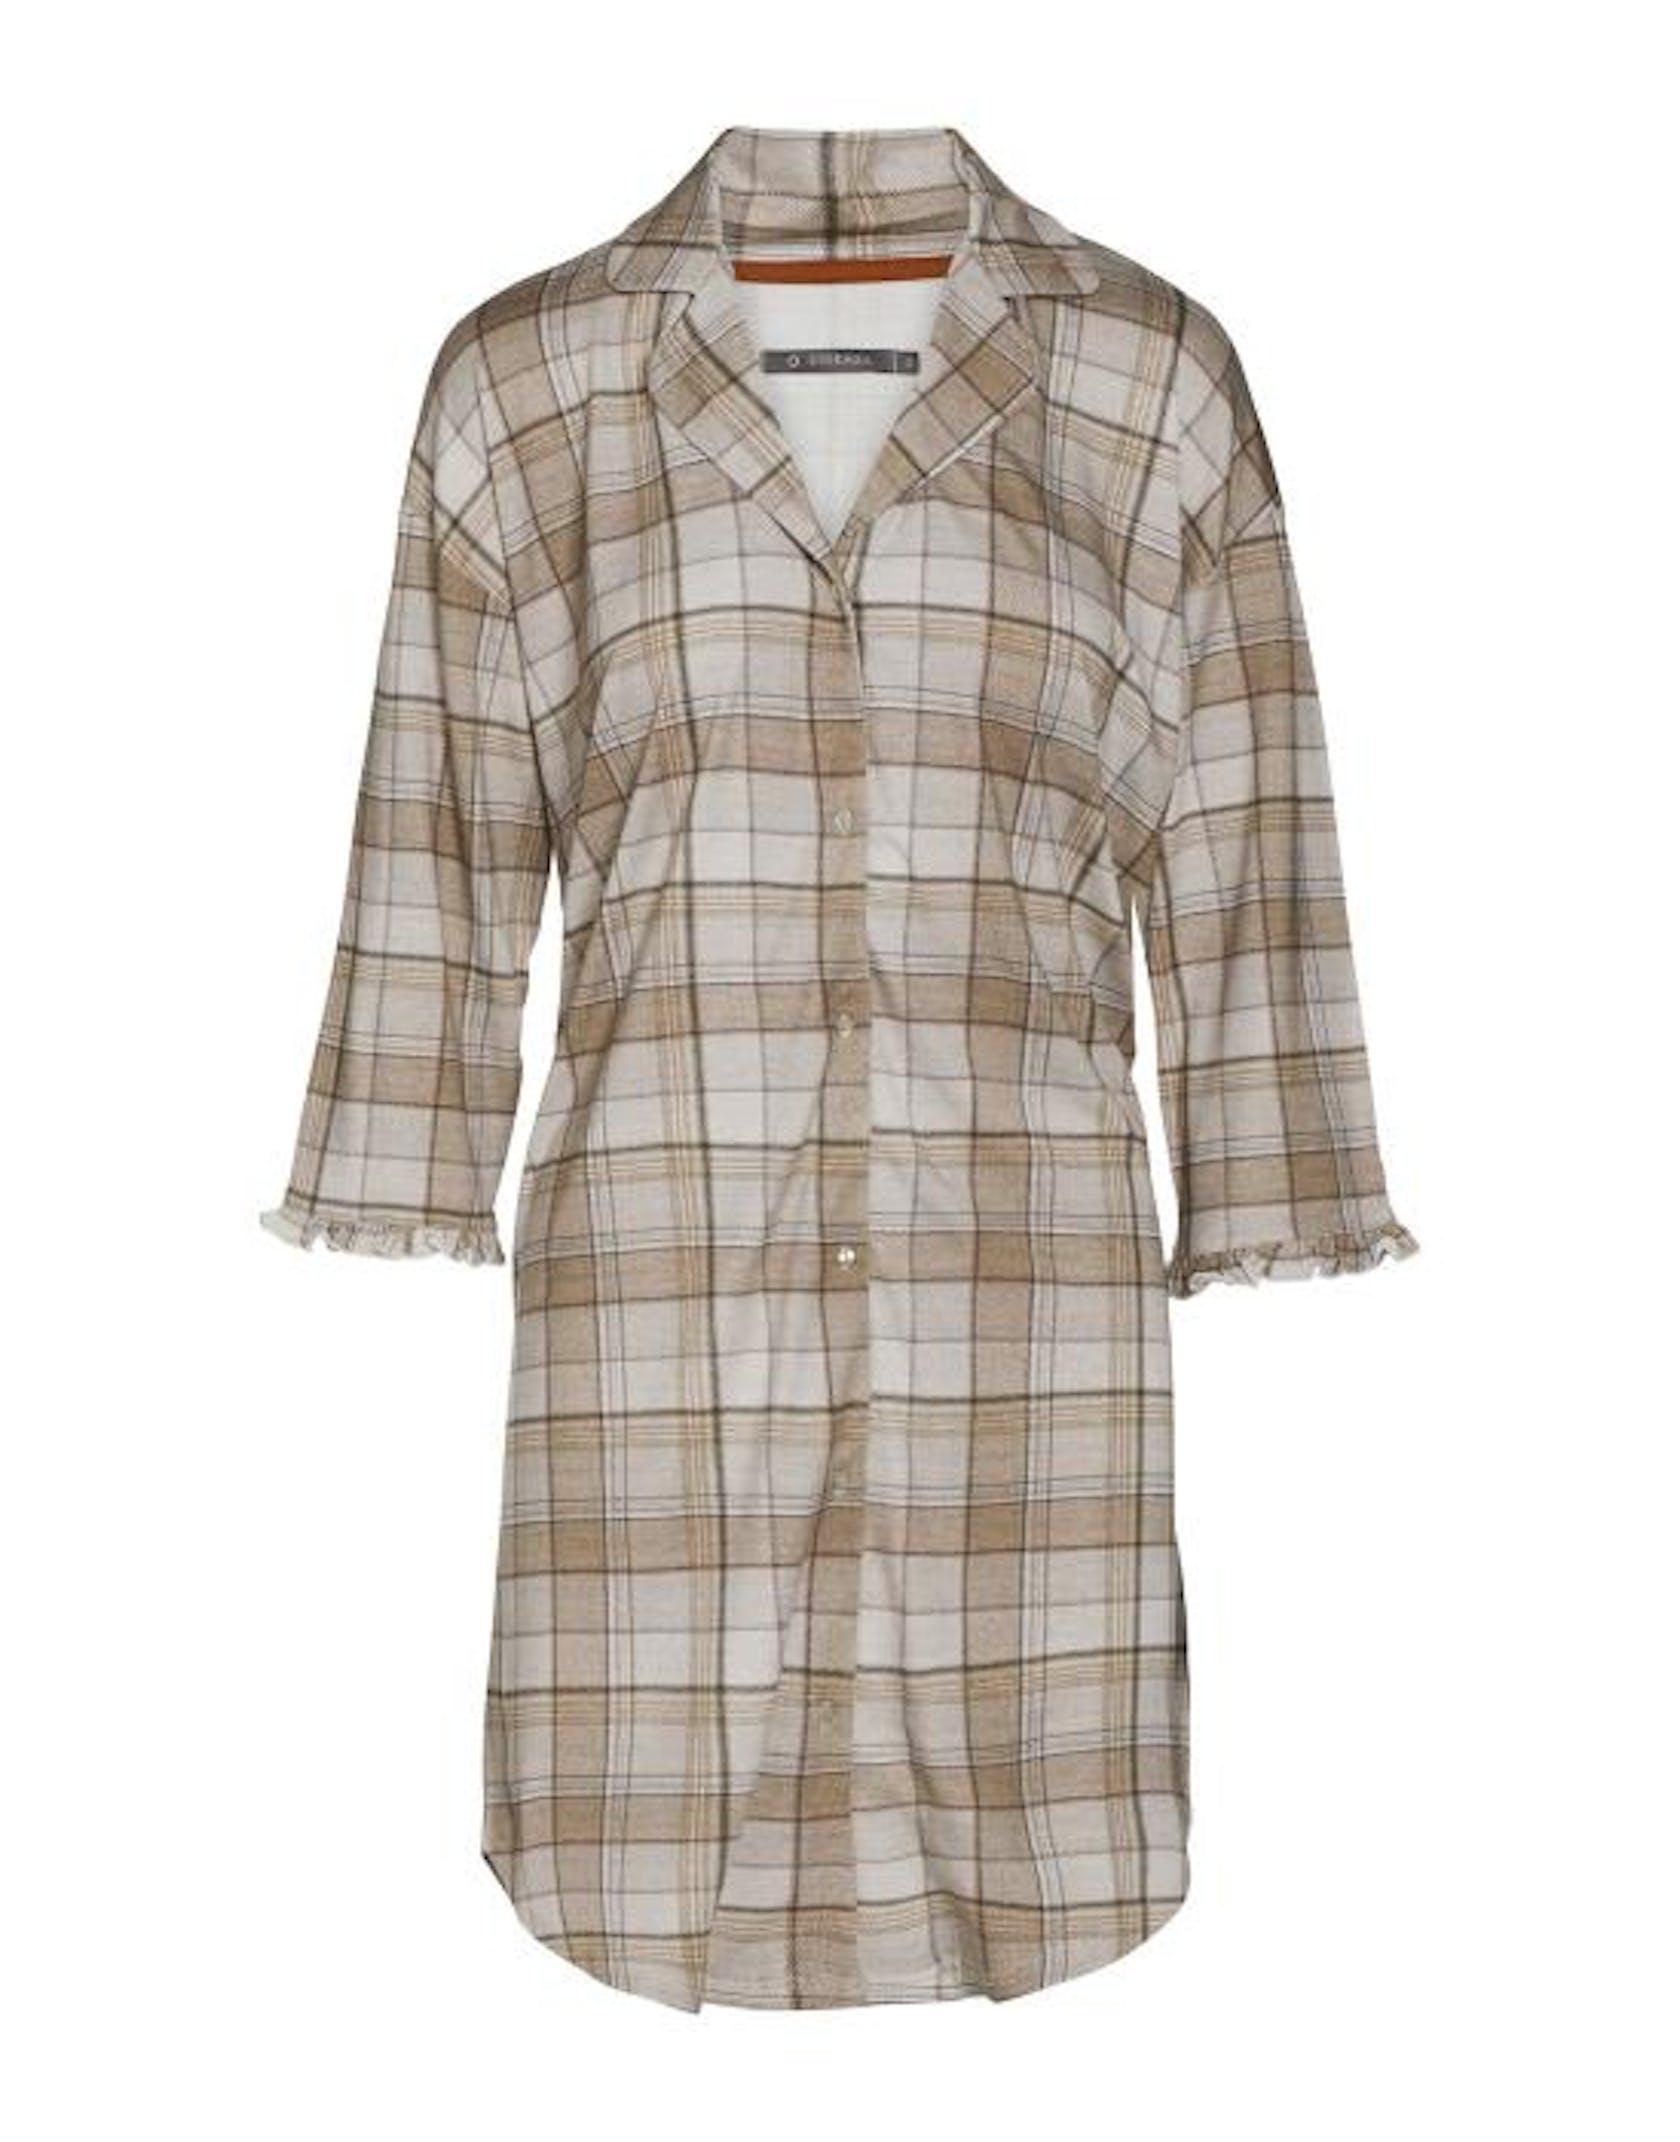 ESSENZA Erin Beau Almond Nightdress 3/4 sleeve M